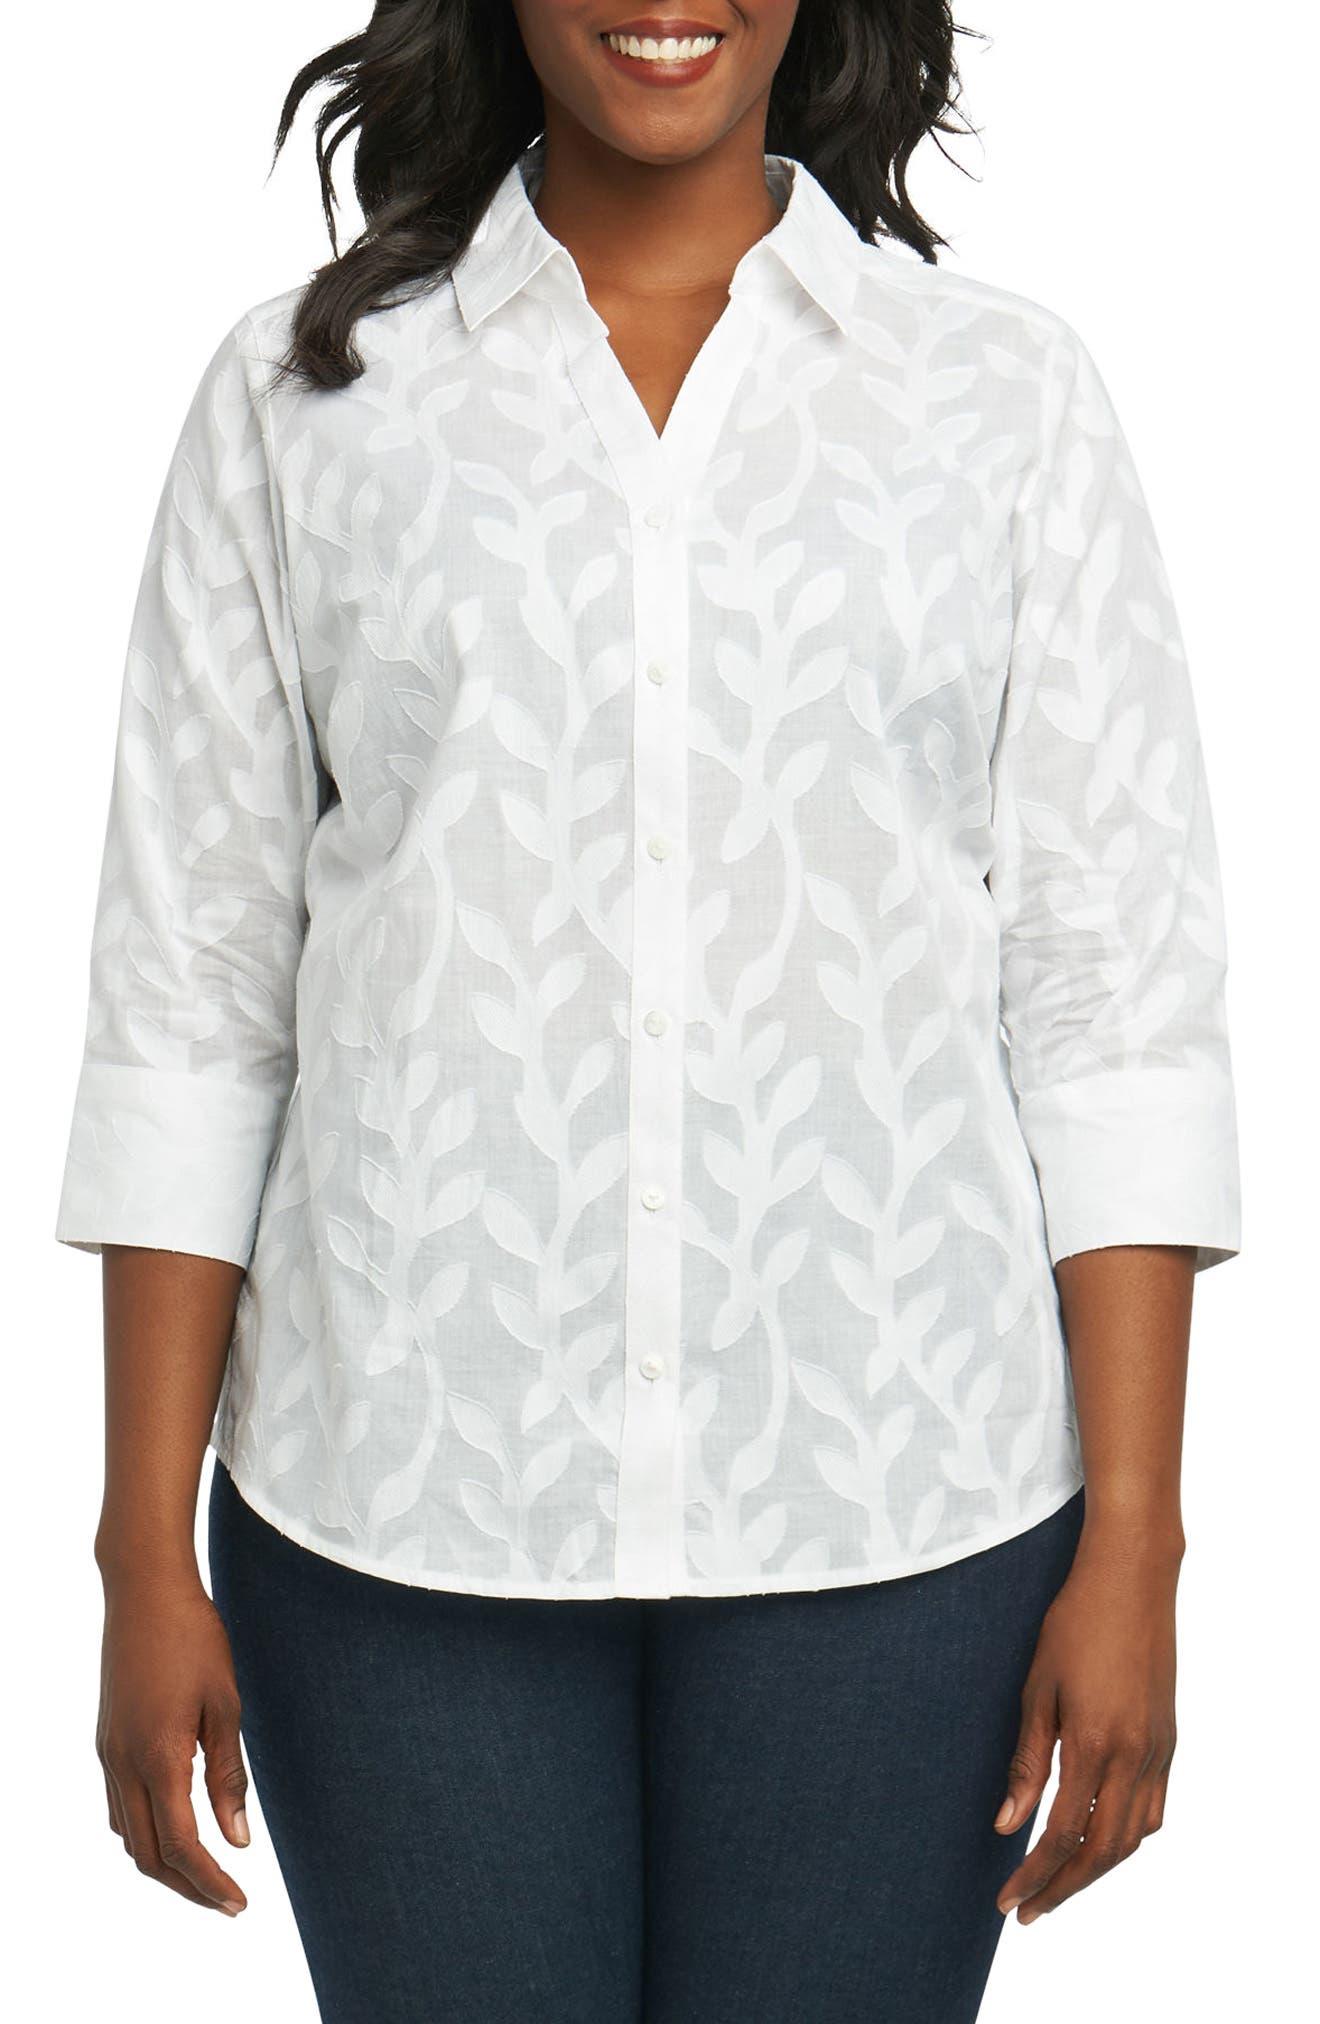 Mary Palm Jacquard Shirt,                         Main,                         color, White